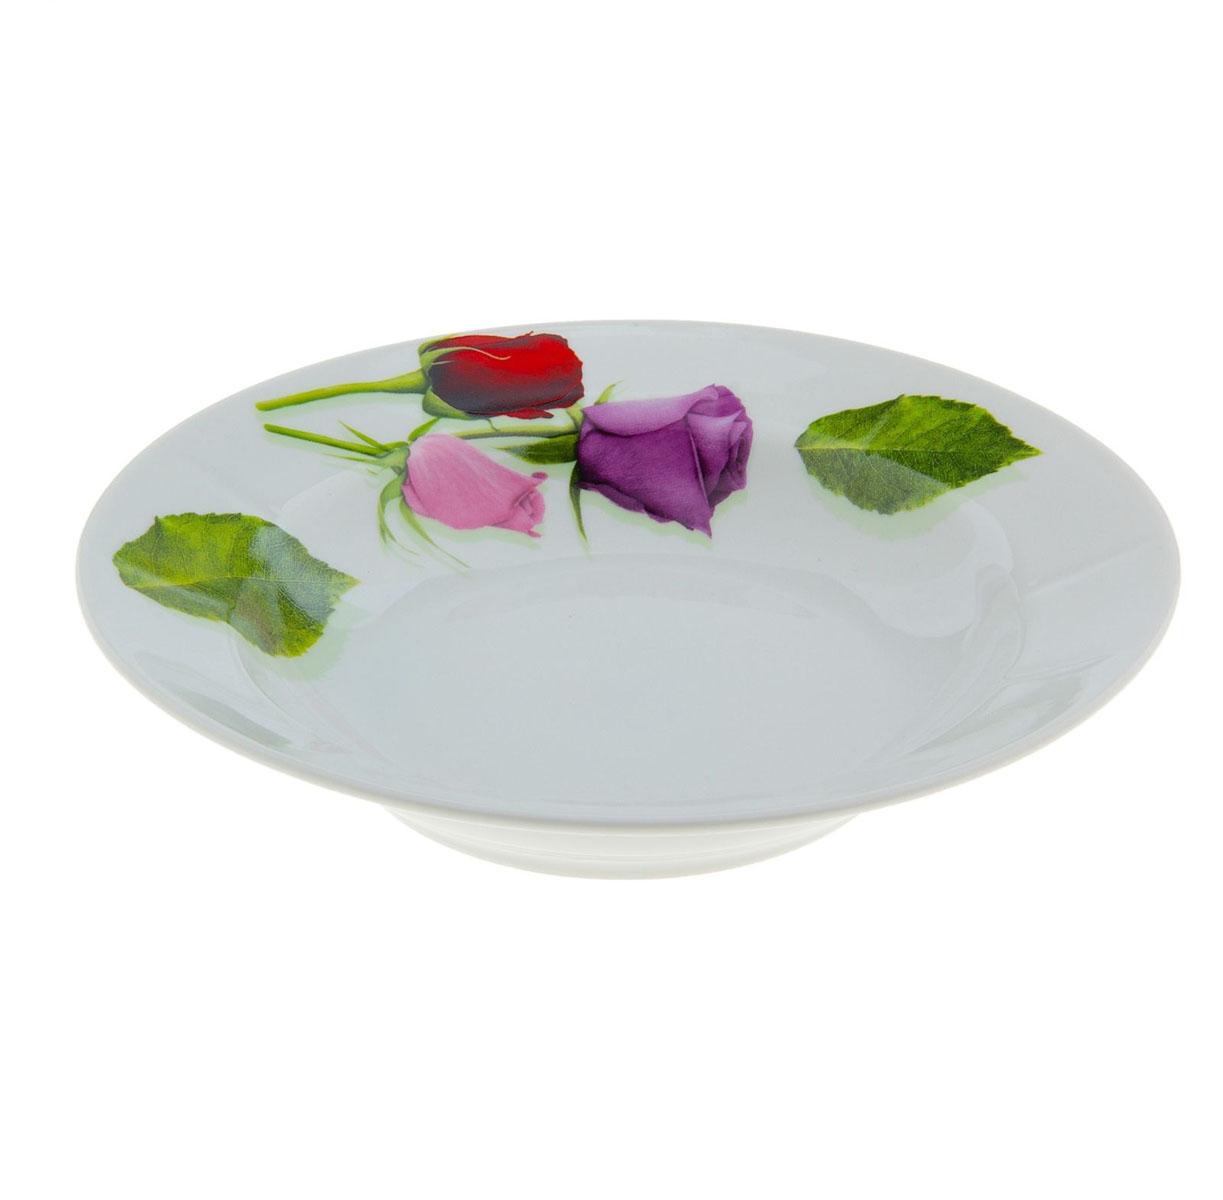 Тарелка глубокая Идиллия. Королева цветов, диаметр 20 см507764